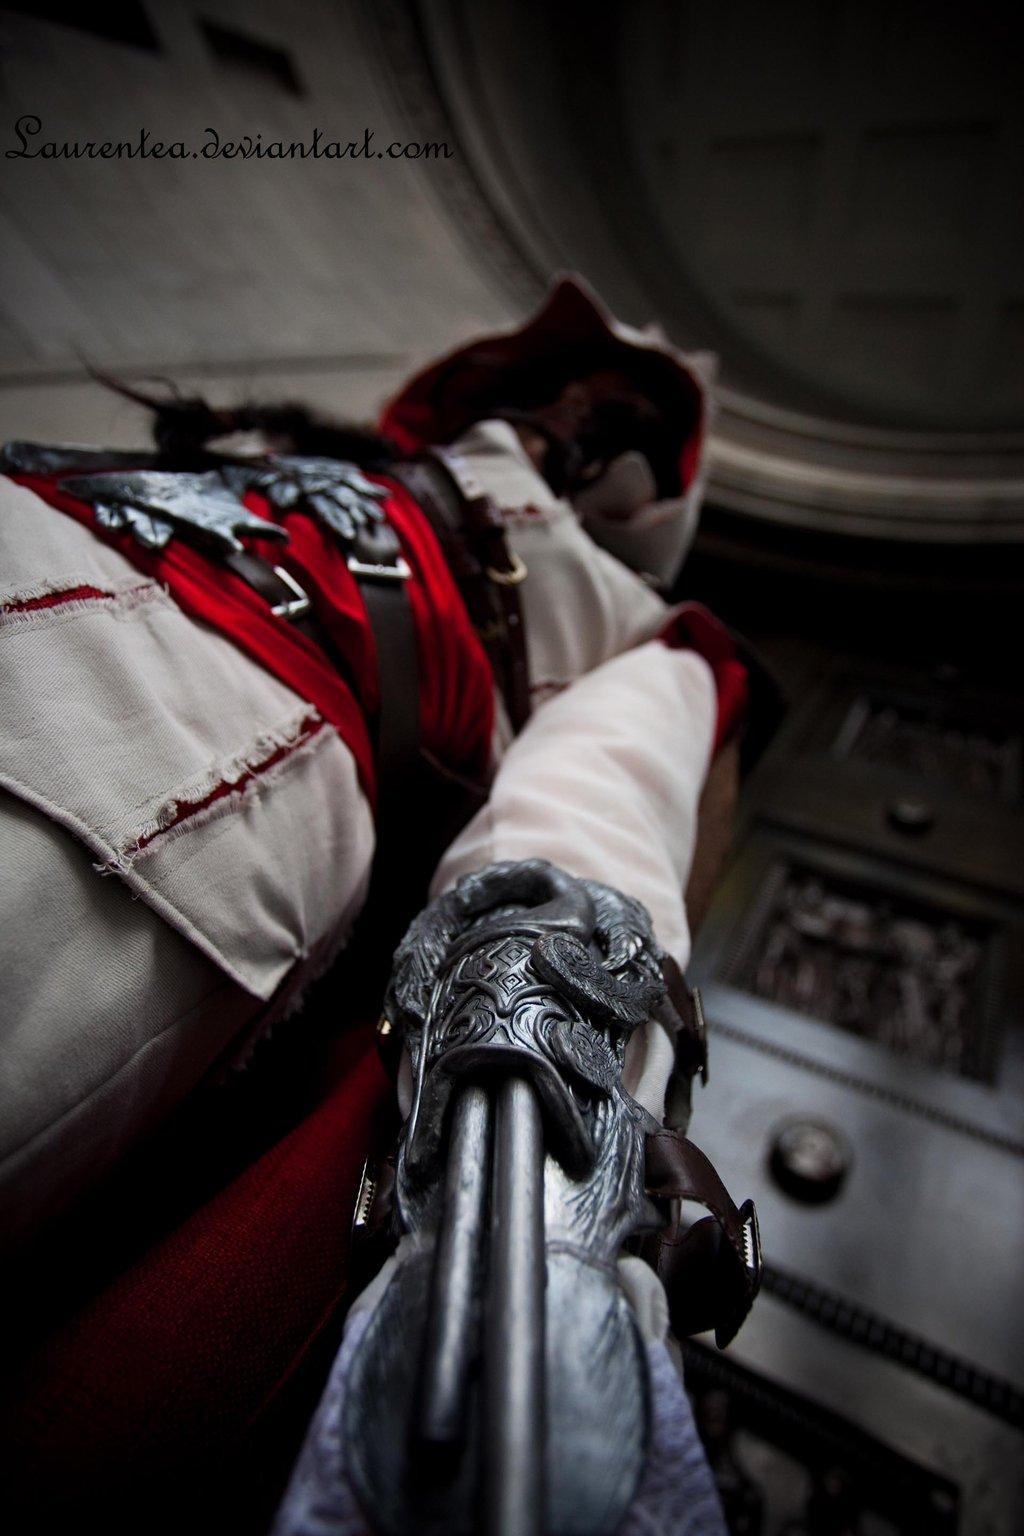 http://1.bp.blogspot.com/-J_WscUp_rdQ/TozNYV-j9sI/AAAAAAAABSo/6pad5r7IdY0/s1600/Lady+Assassin+Ezio.jpg